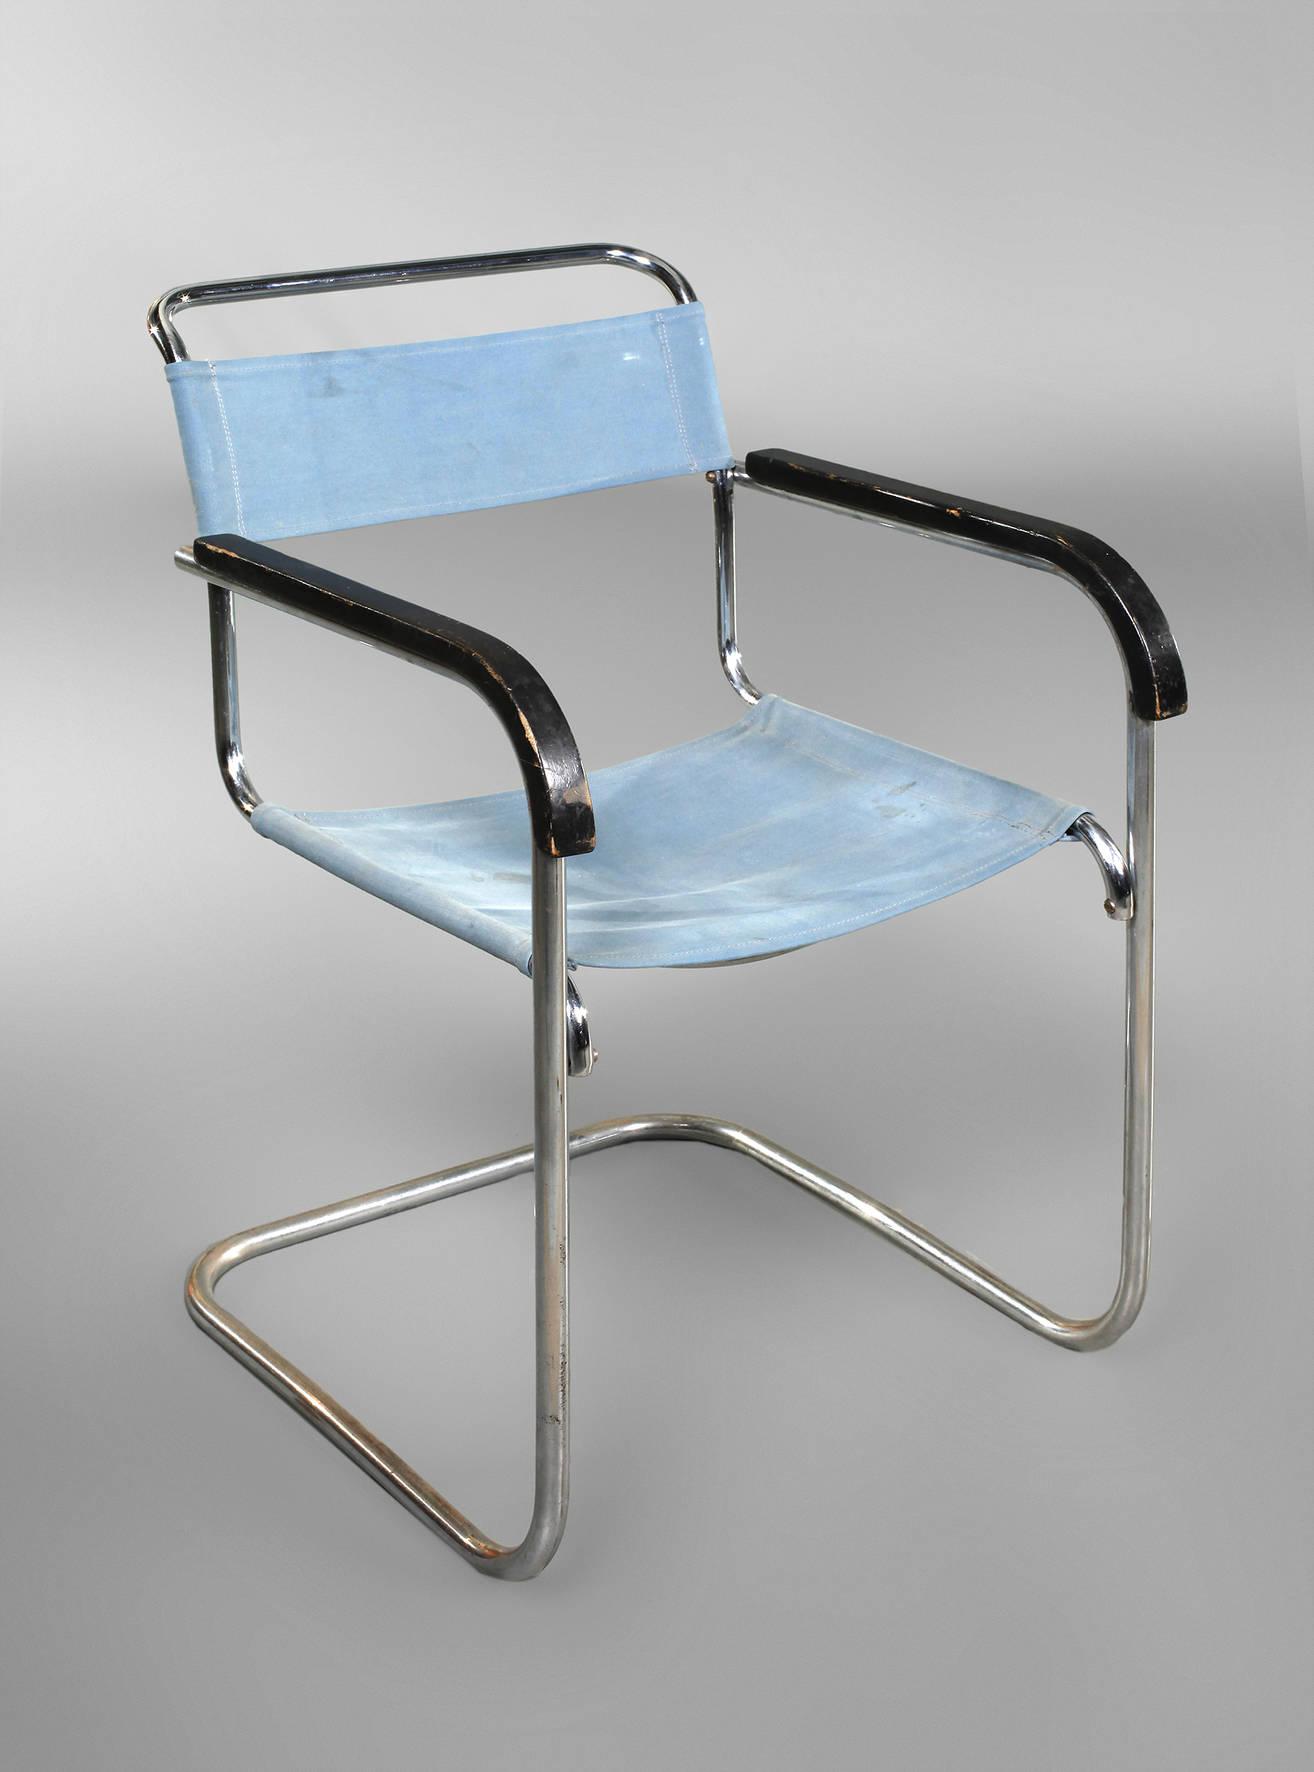 auktionshaus mehlis auktionen. Black Bedroom Furniture Sets. Home Design Ideas